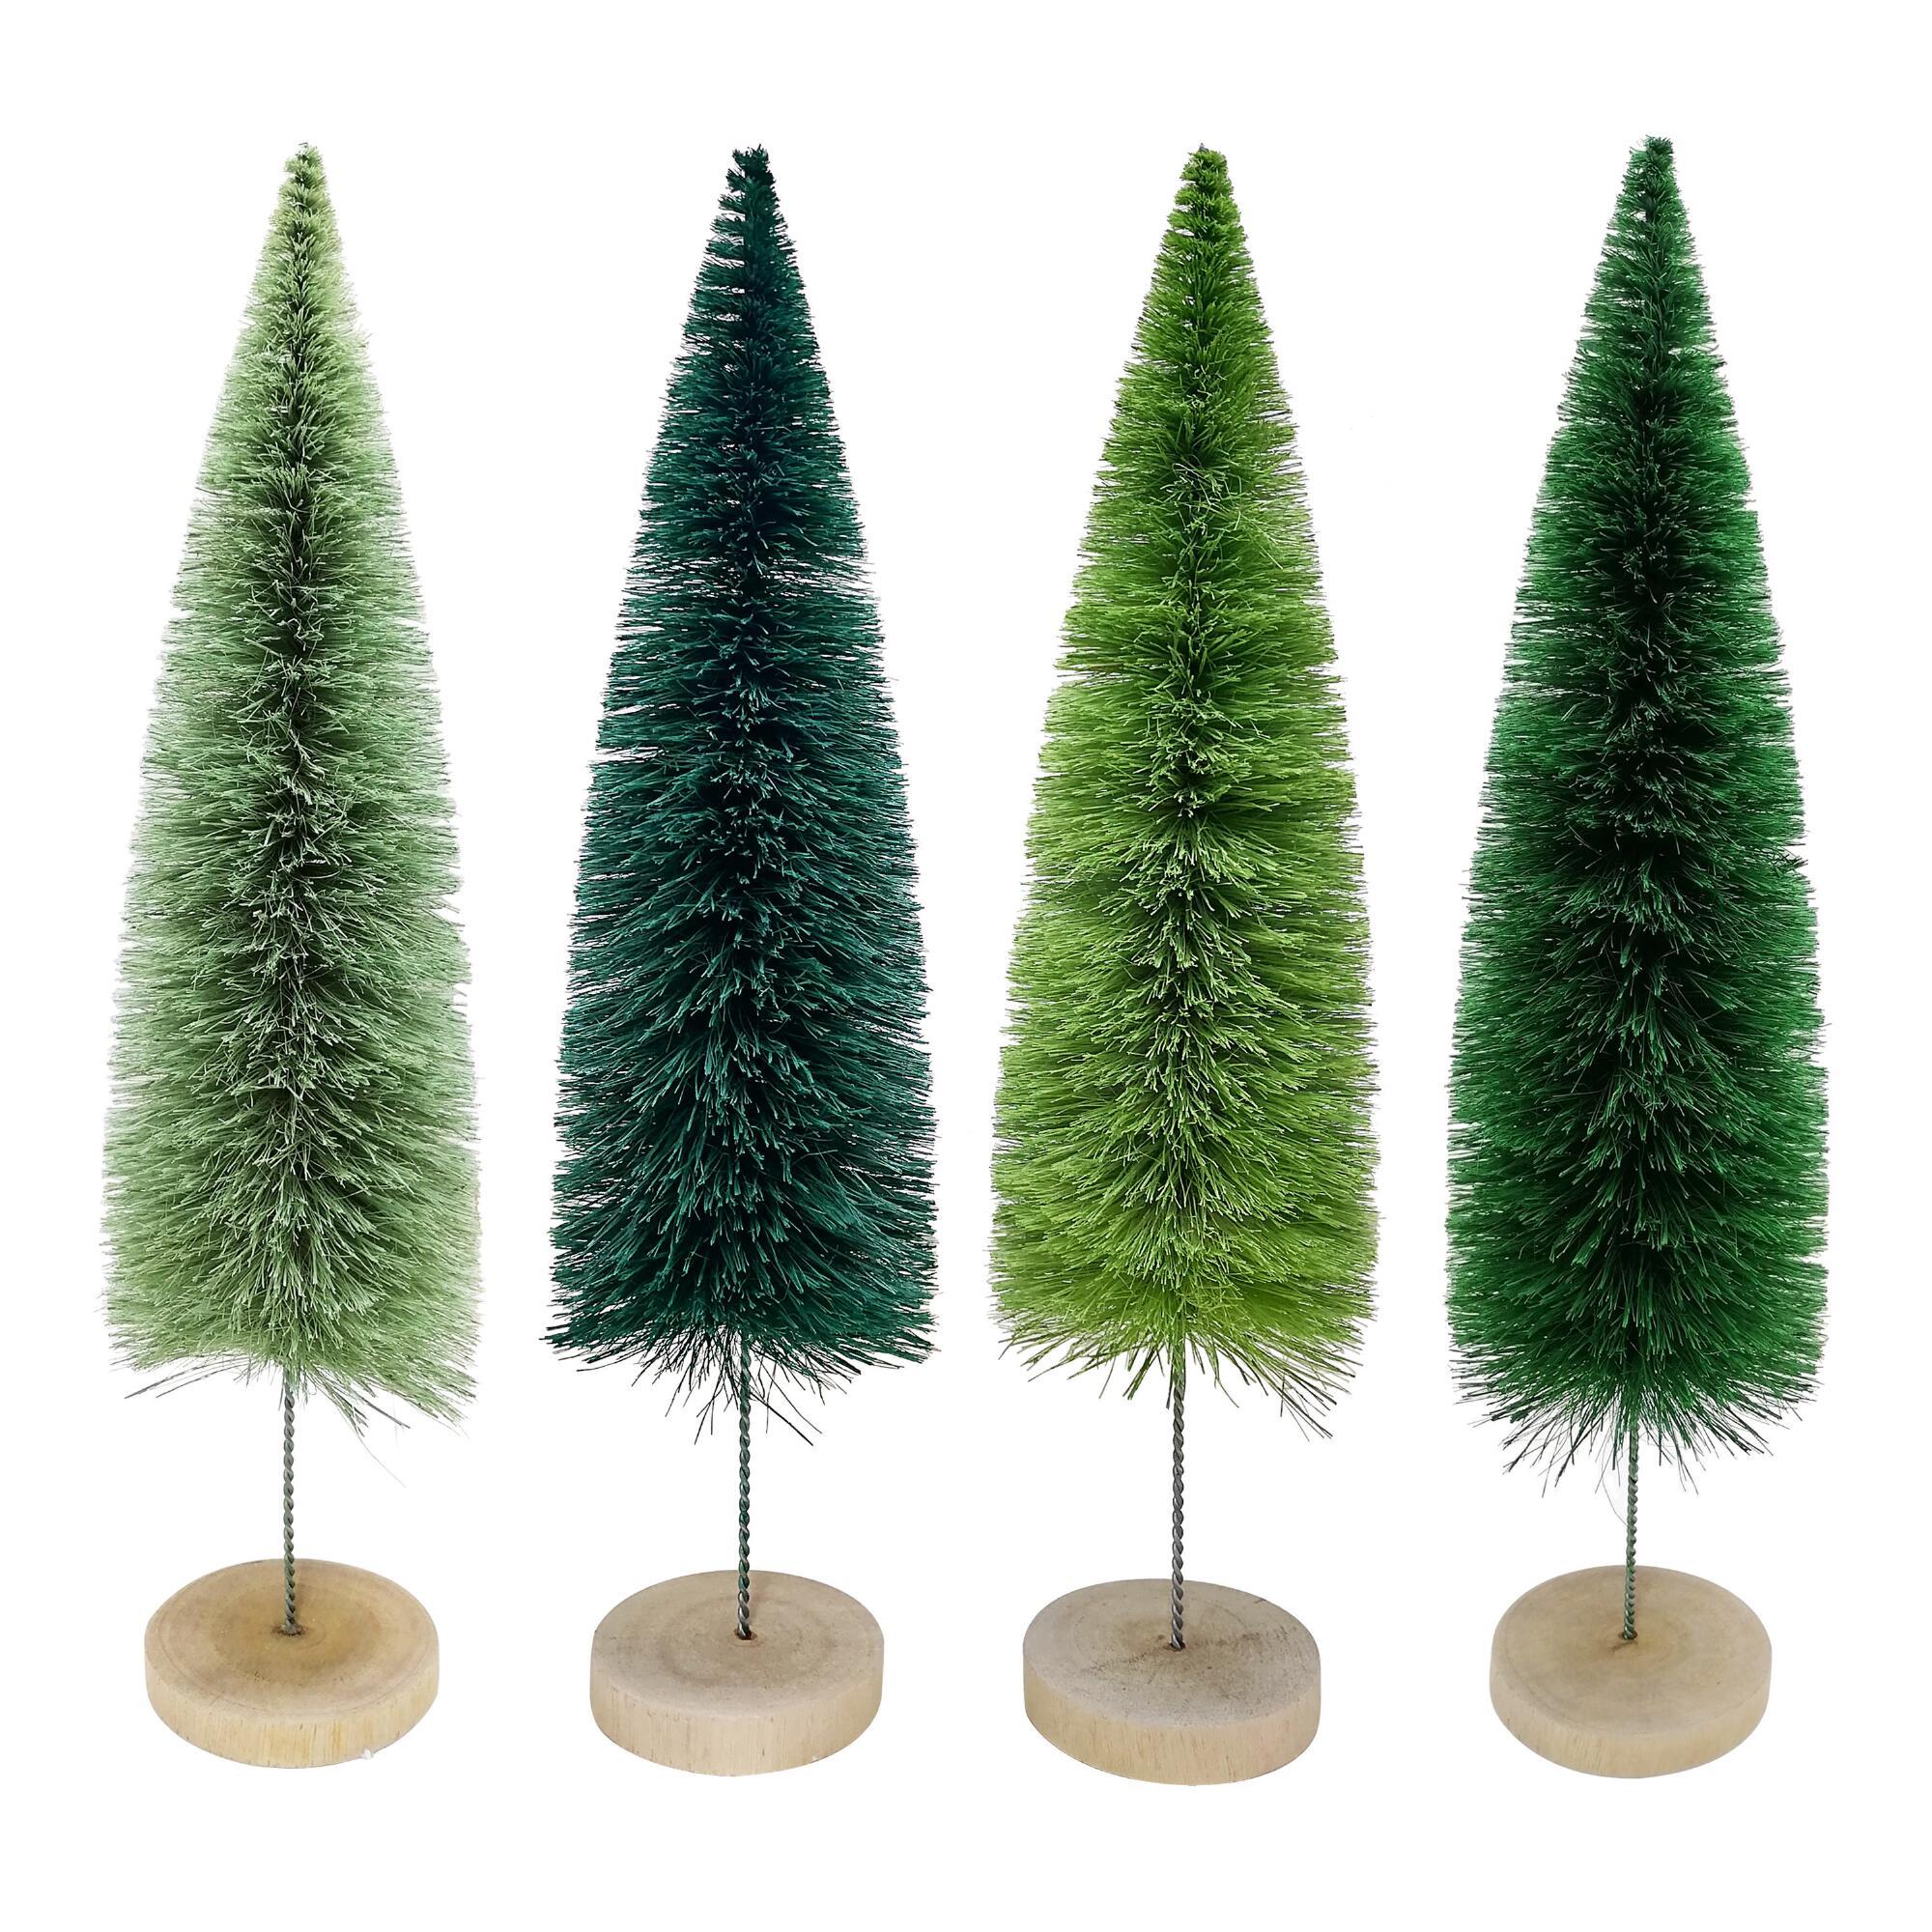 Large Green Bottlebrush Trees Set Of 4 $31.96